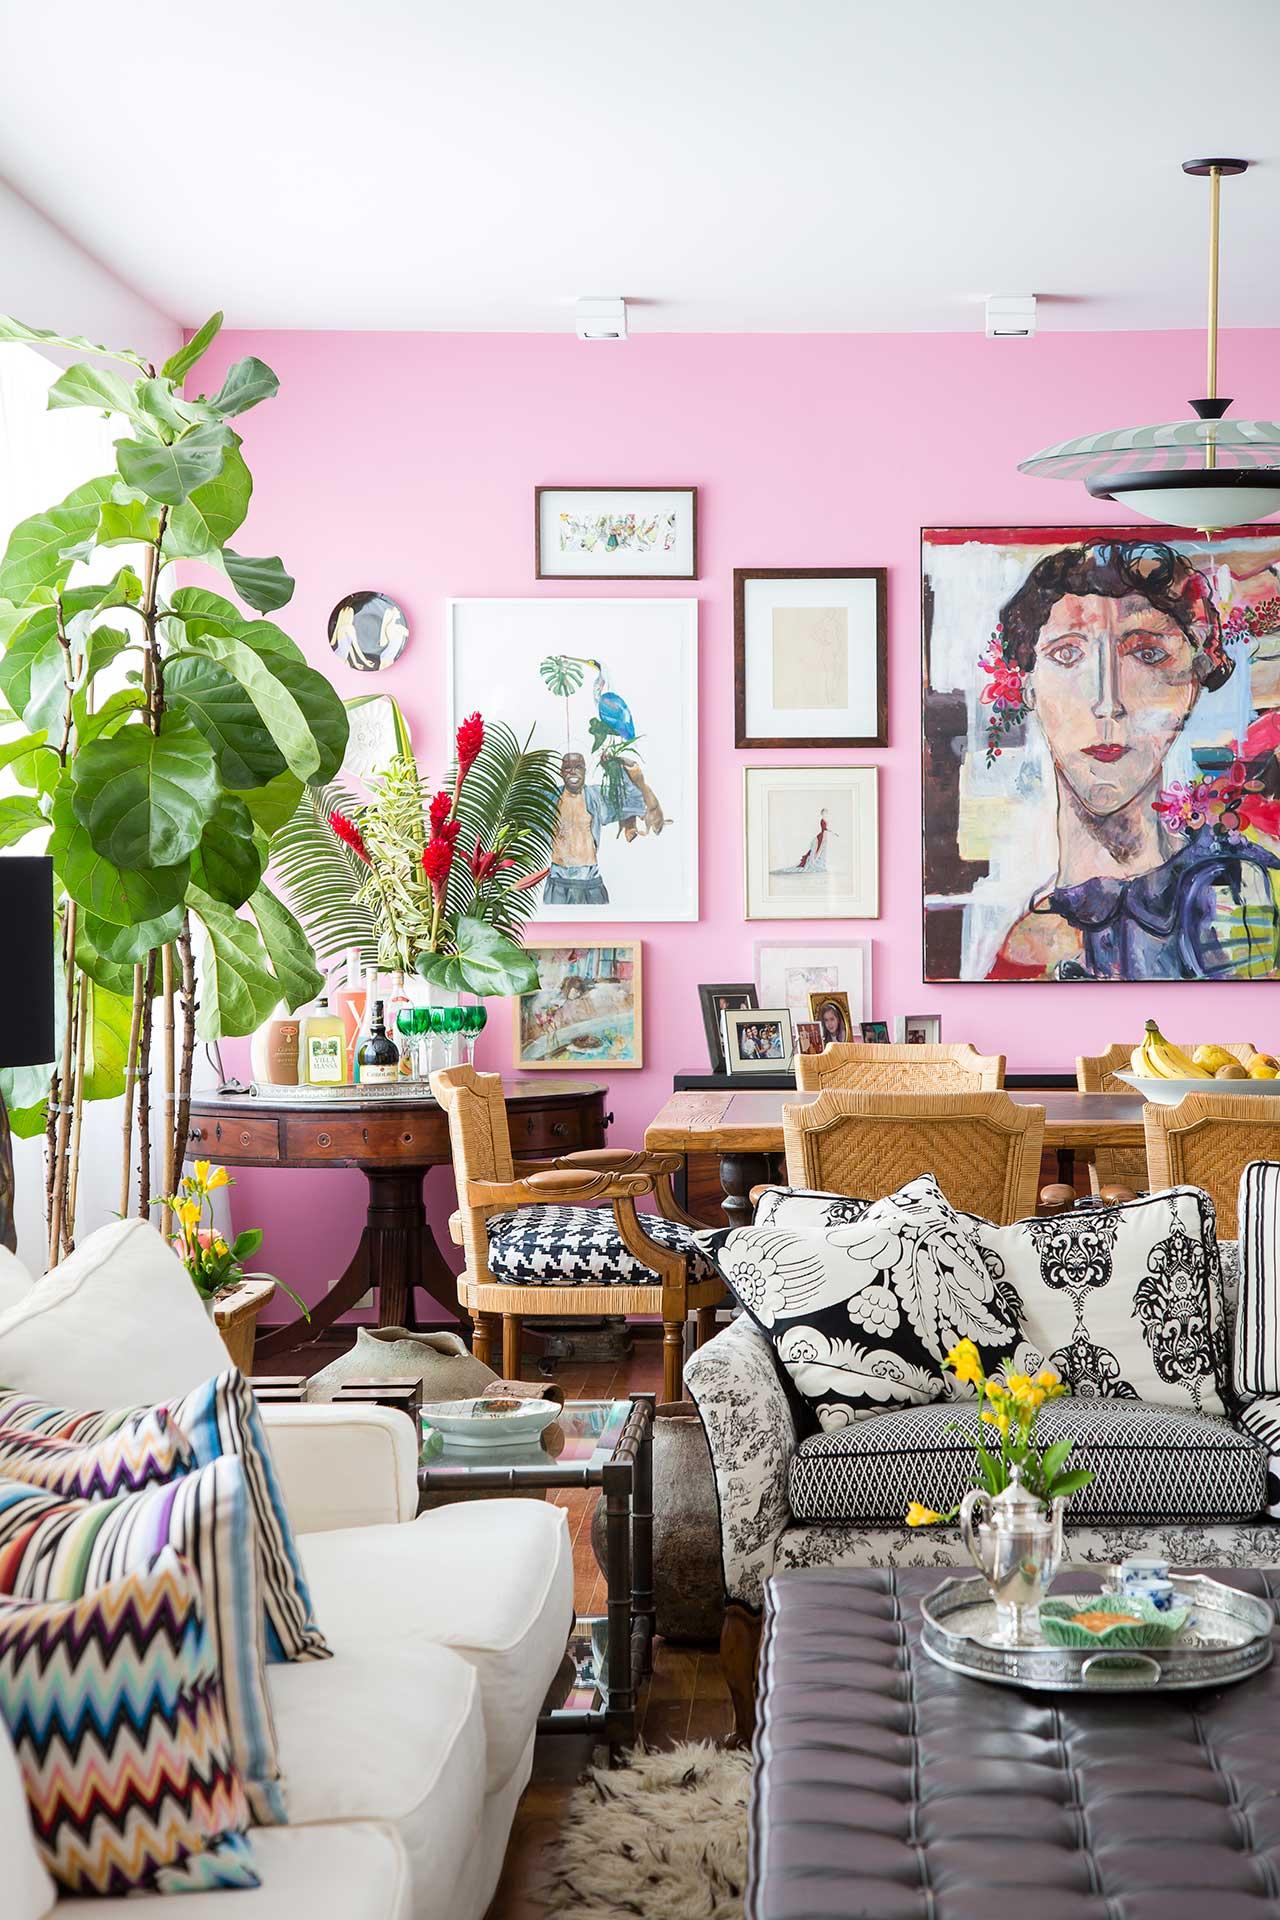 f4_ana_strumpf_apartment_ibiapinopolis_sao_paulo_brazil_yatzer